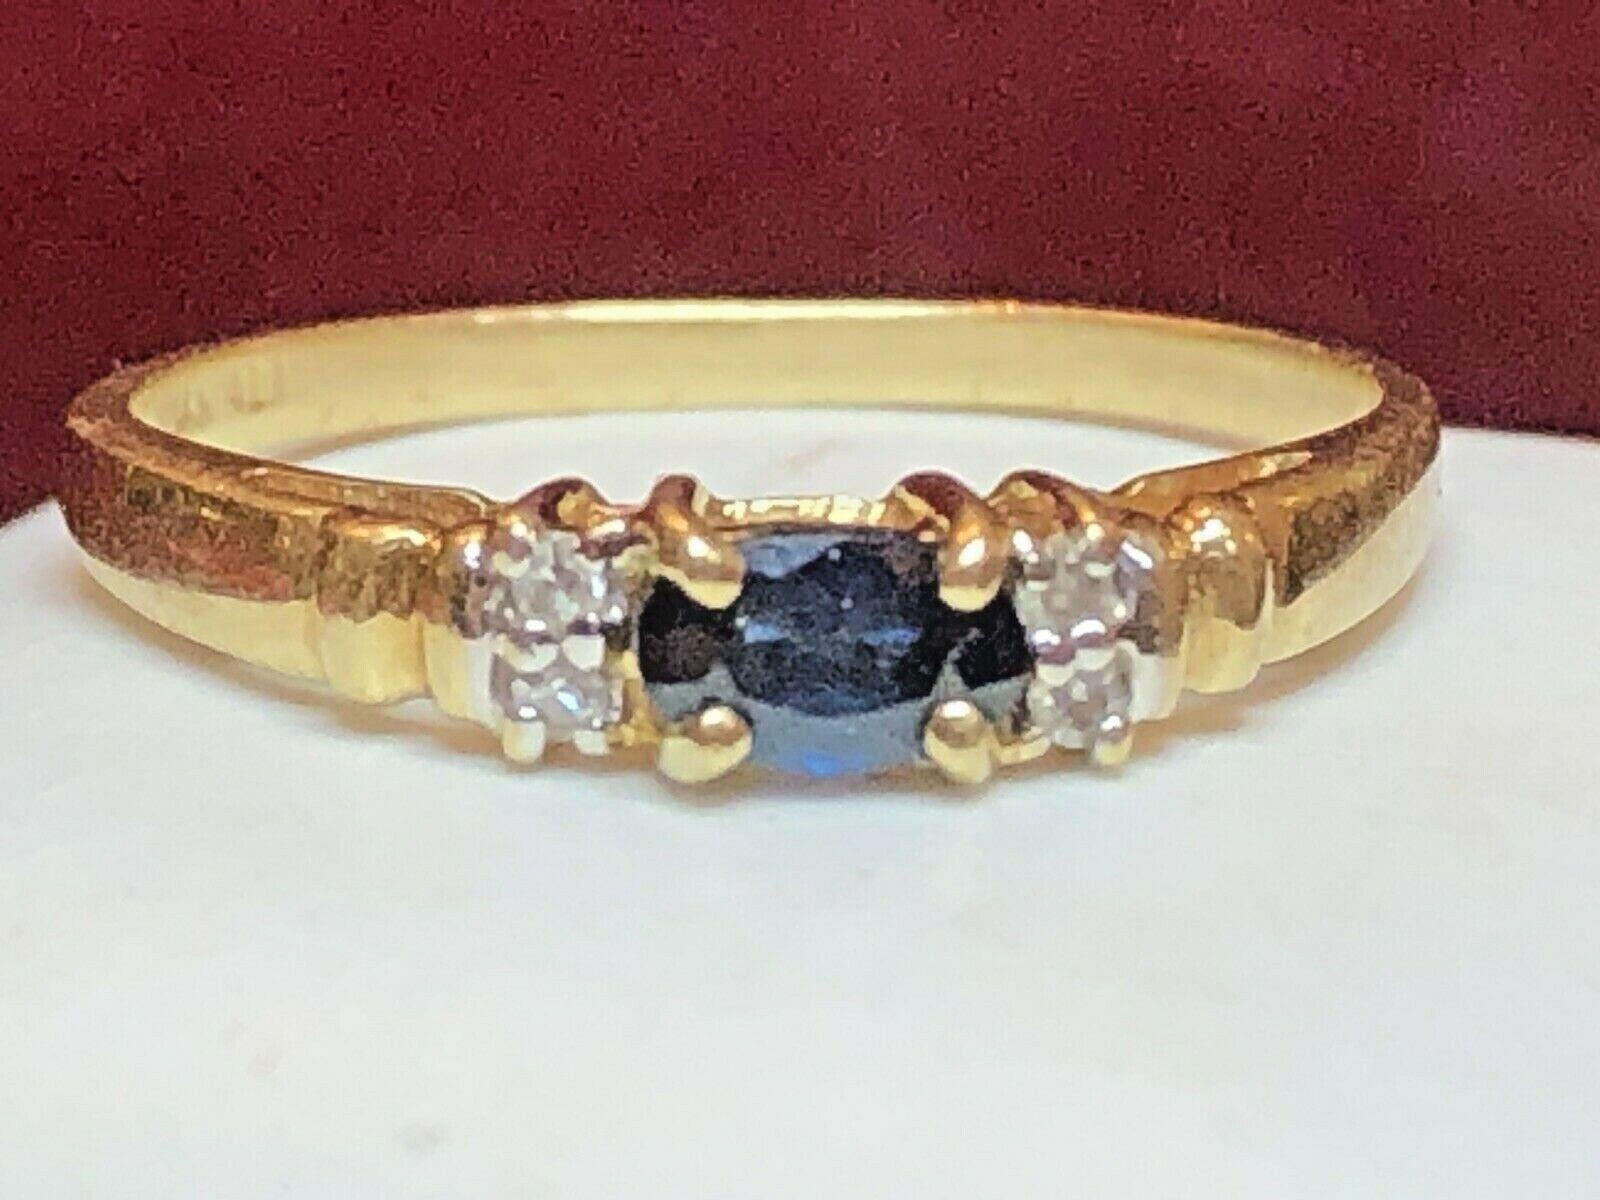 VINTAGE ESTATE 14K GOLD NATURAL BLUE SAPPHIRE DIAMOND RING ENGAGEMENT SIGNED ALI